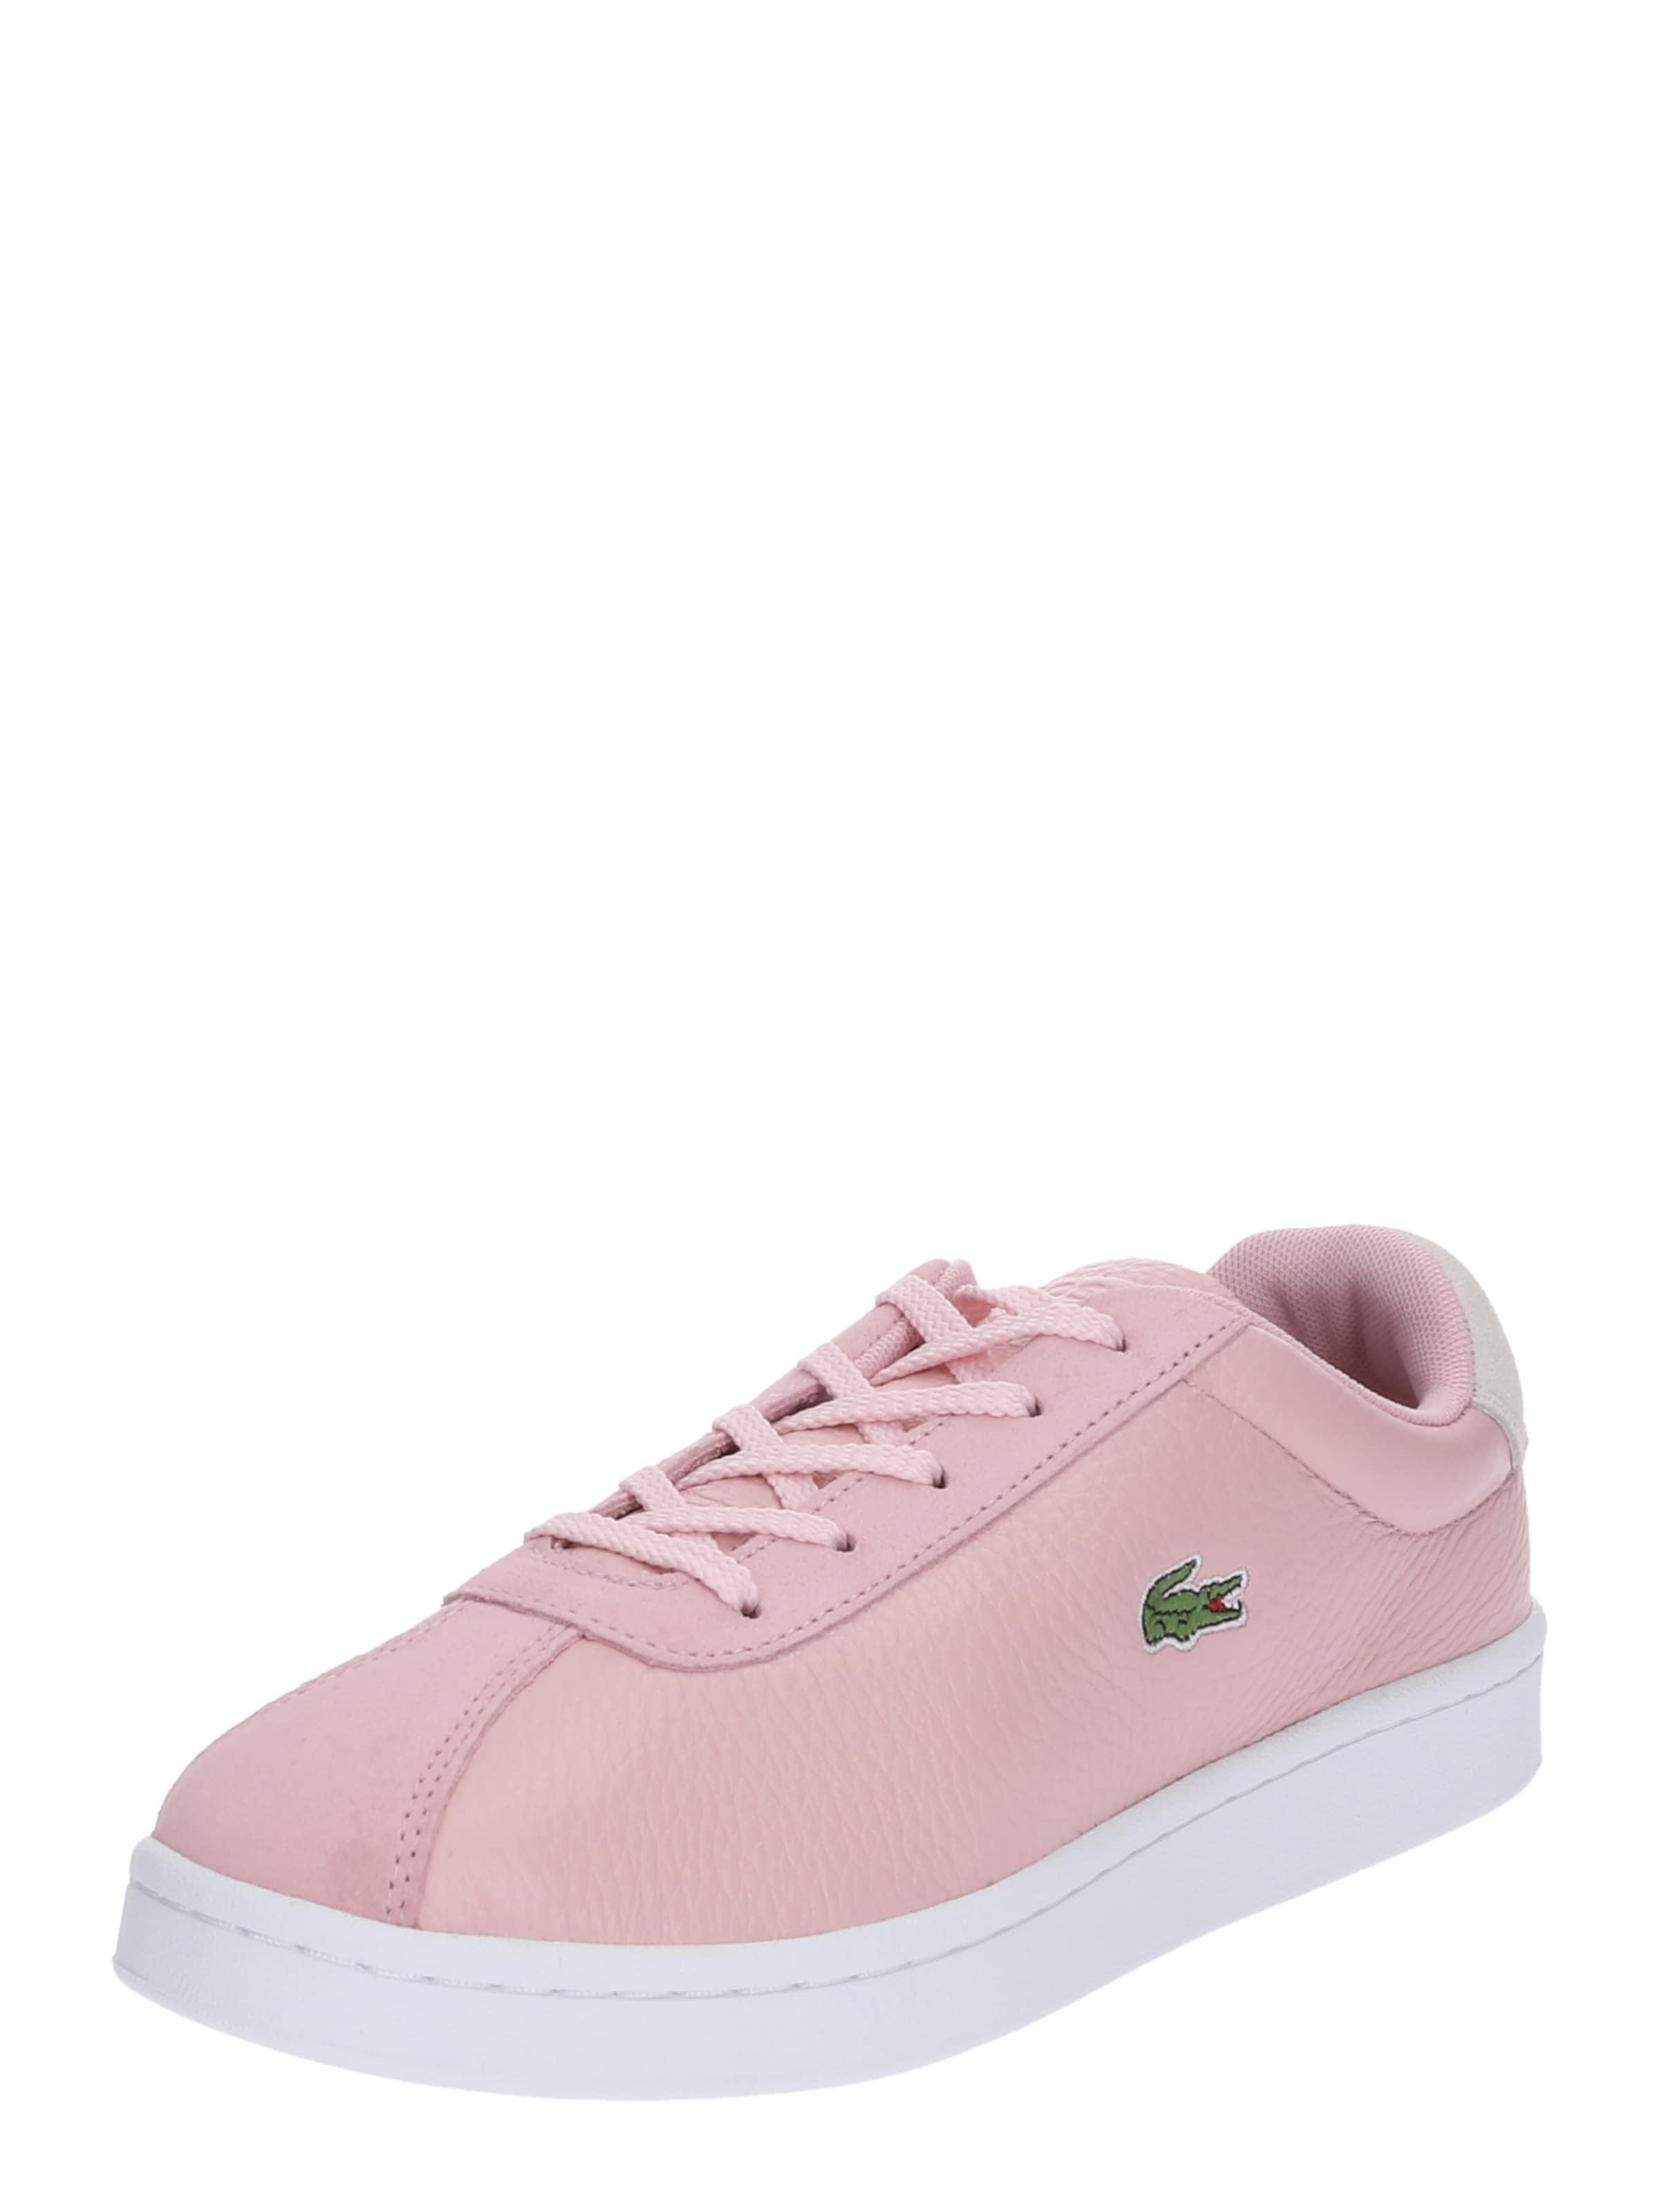 Sneaker Lacoste Sfa' In 'masters 2 Rosa 119 1TKuFc3lJ